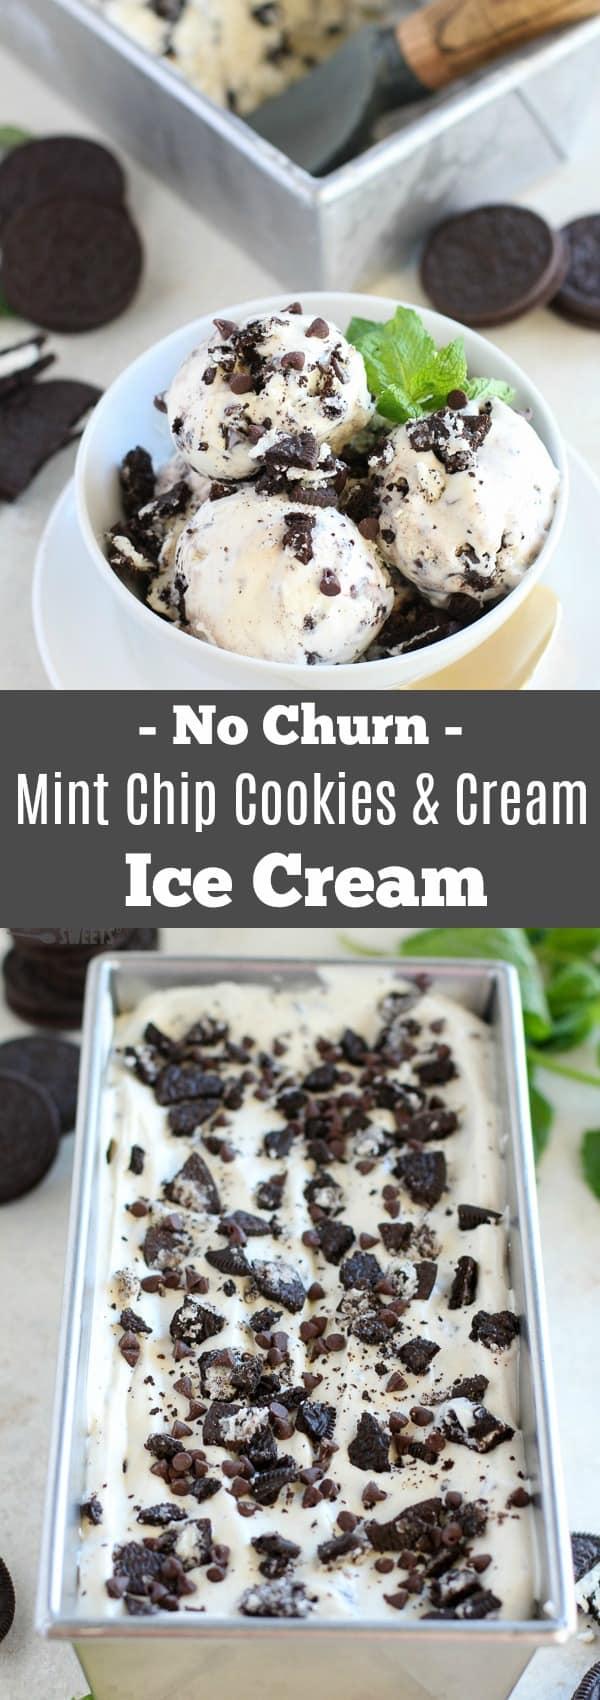 No-Churn Mint Chip Cookies and Cream Ice Cream - Mint Chip combines with Cookies and Cream in the easiest, creamiest ice cream ever!